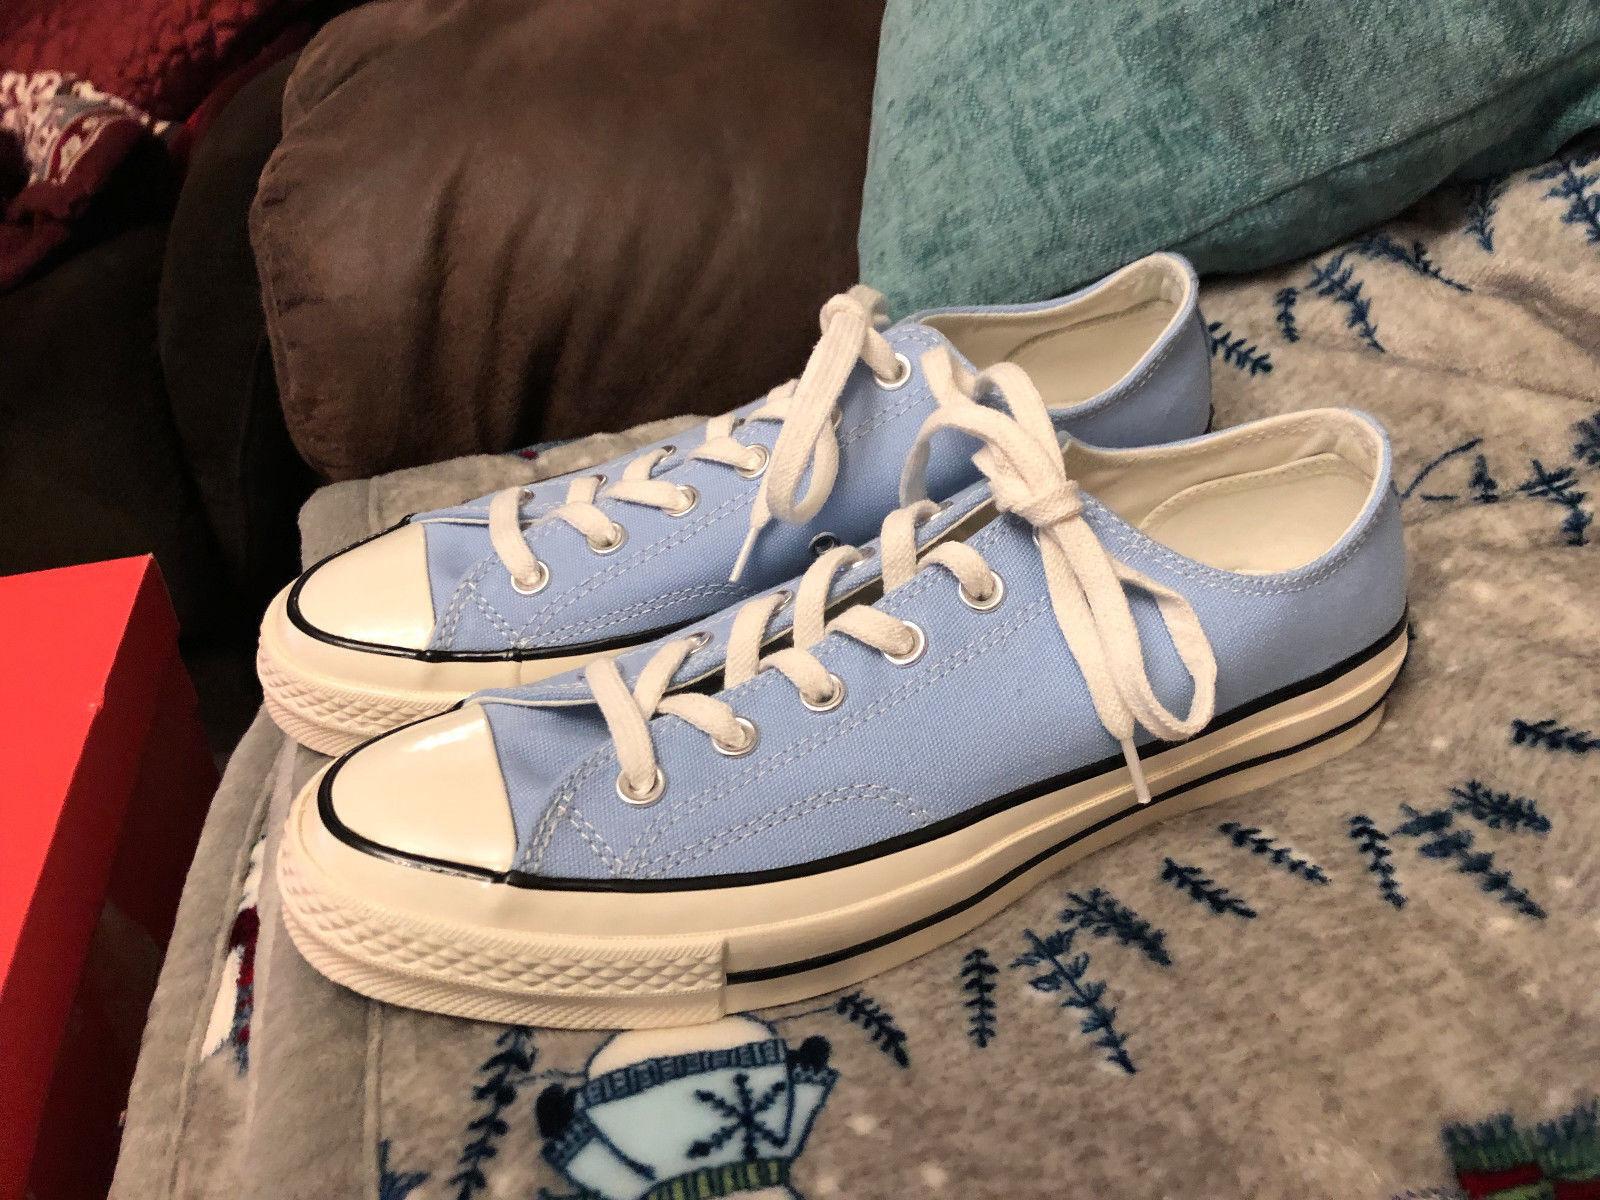 Converse Converse Converse Chuck Taylor All Star 1970s Größe 8 UK Men Sky Blau Light Blau 398571